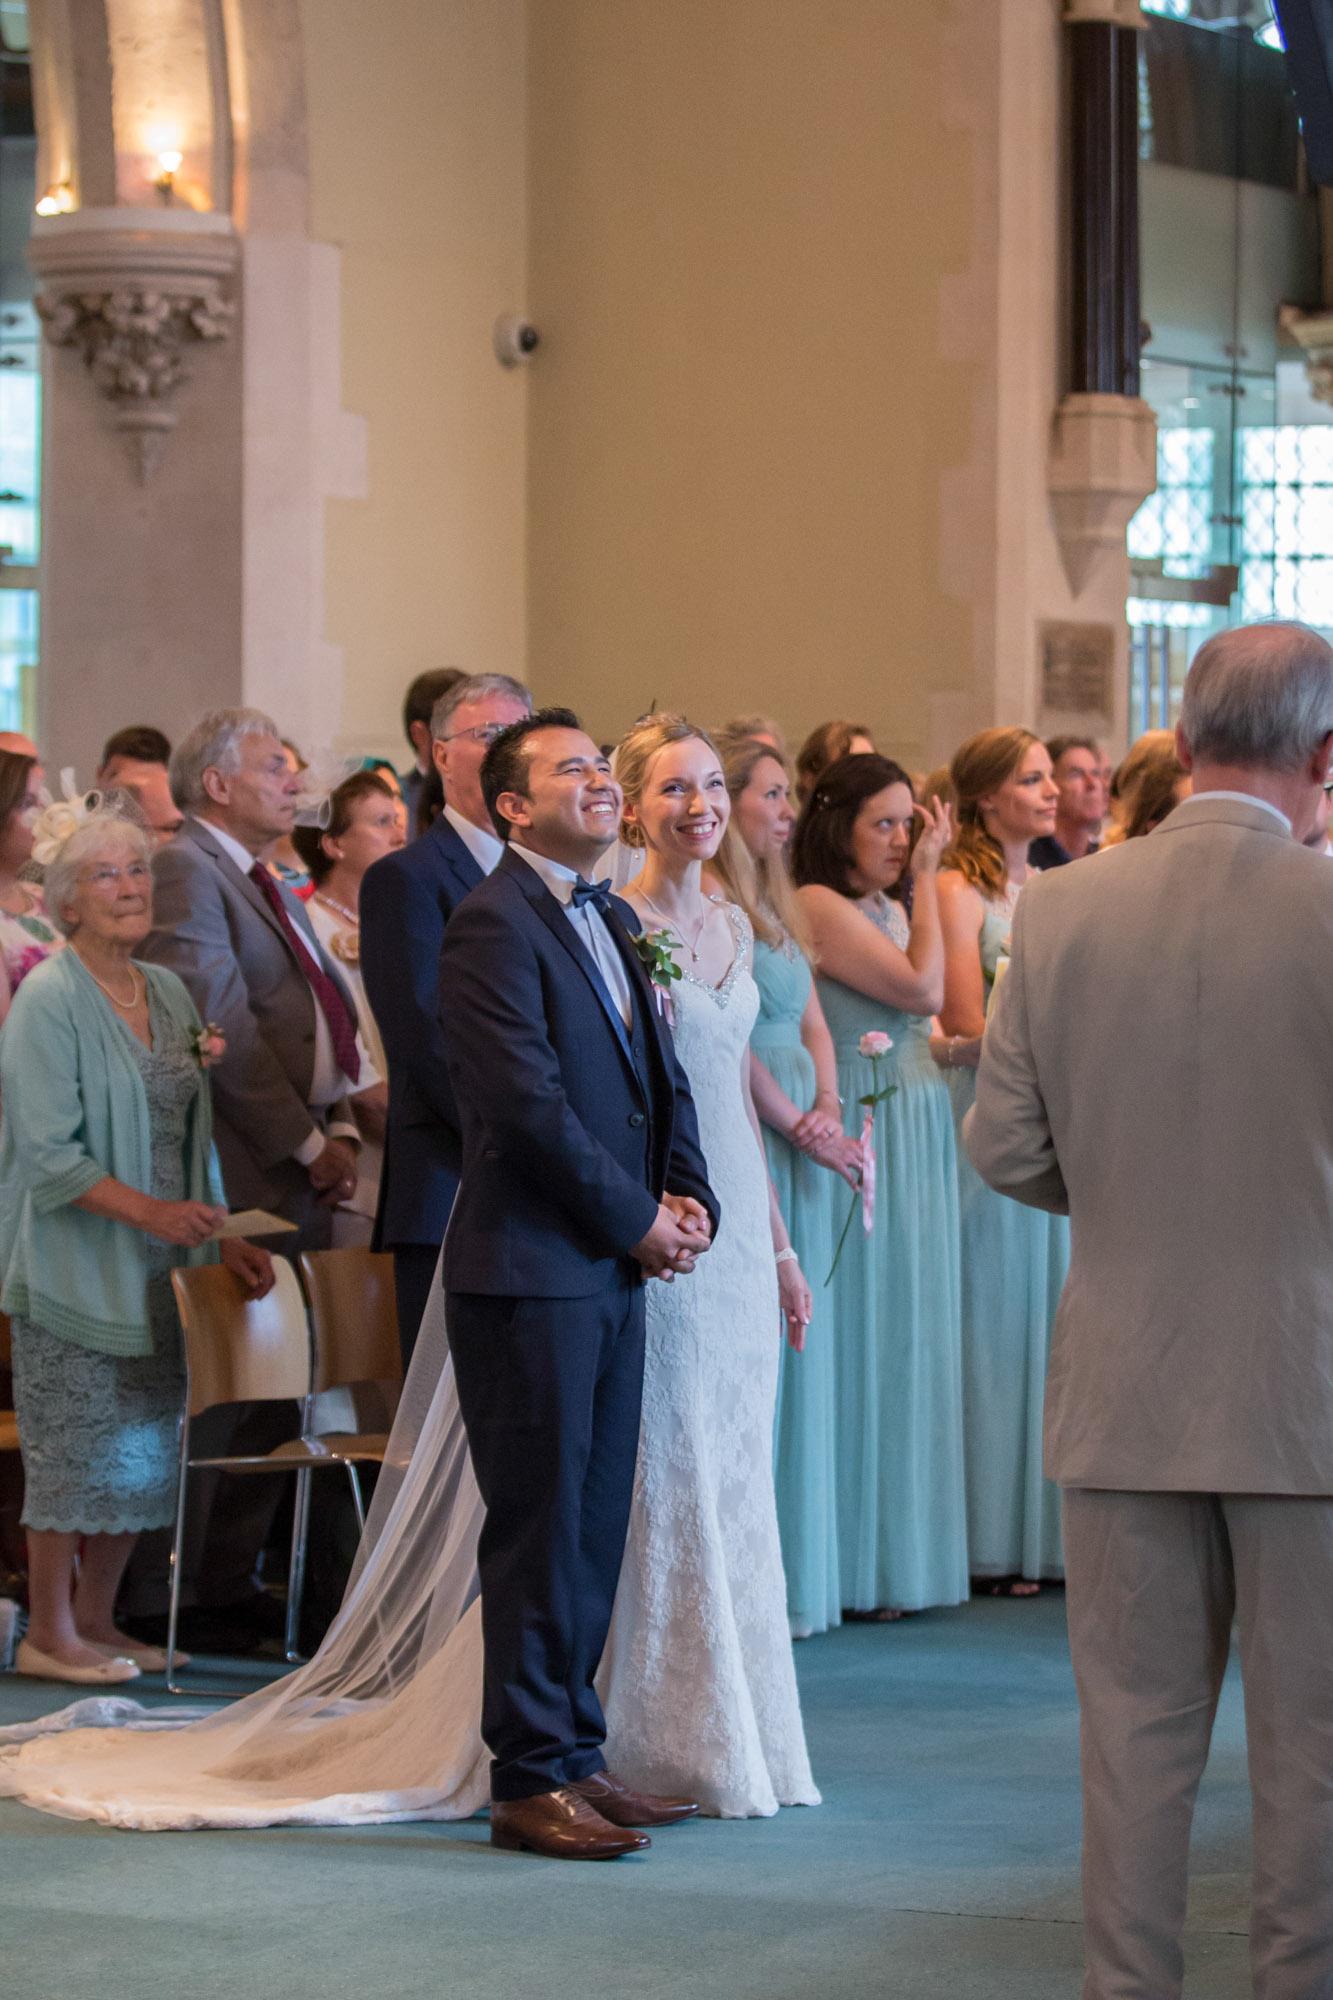 weddings-couples-love-photographer-oxford-london-jonathan-self-photography-27.jpg